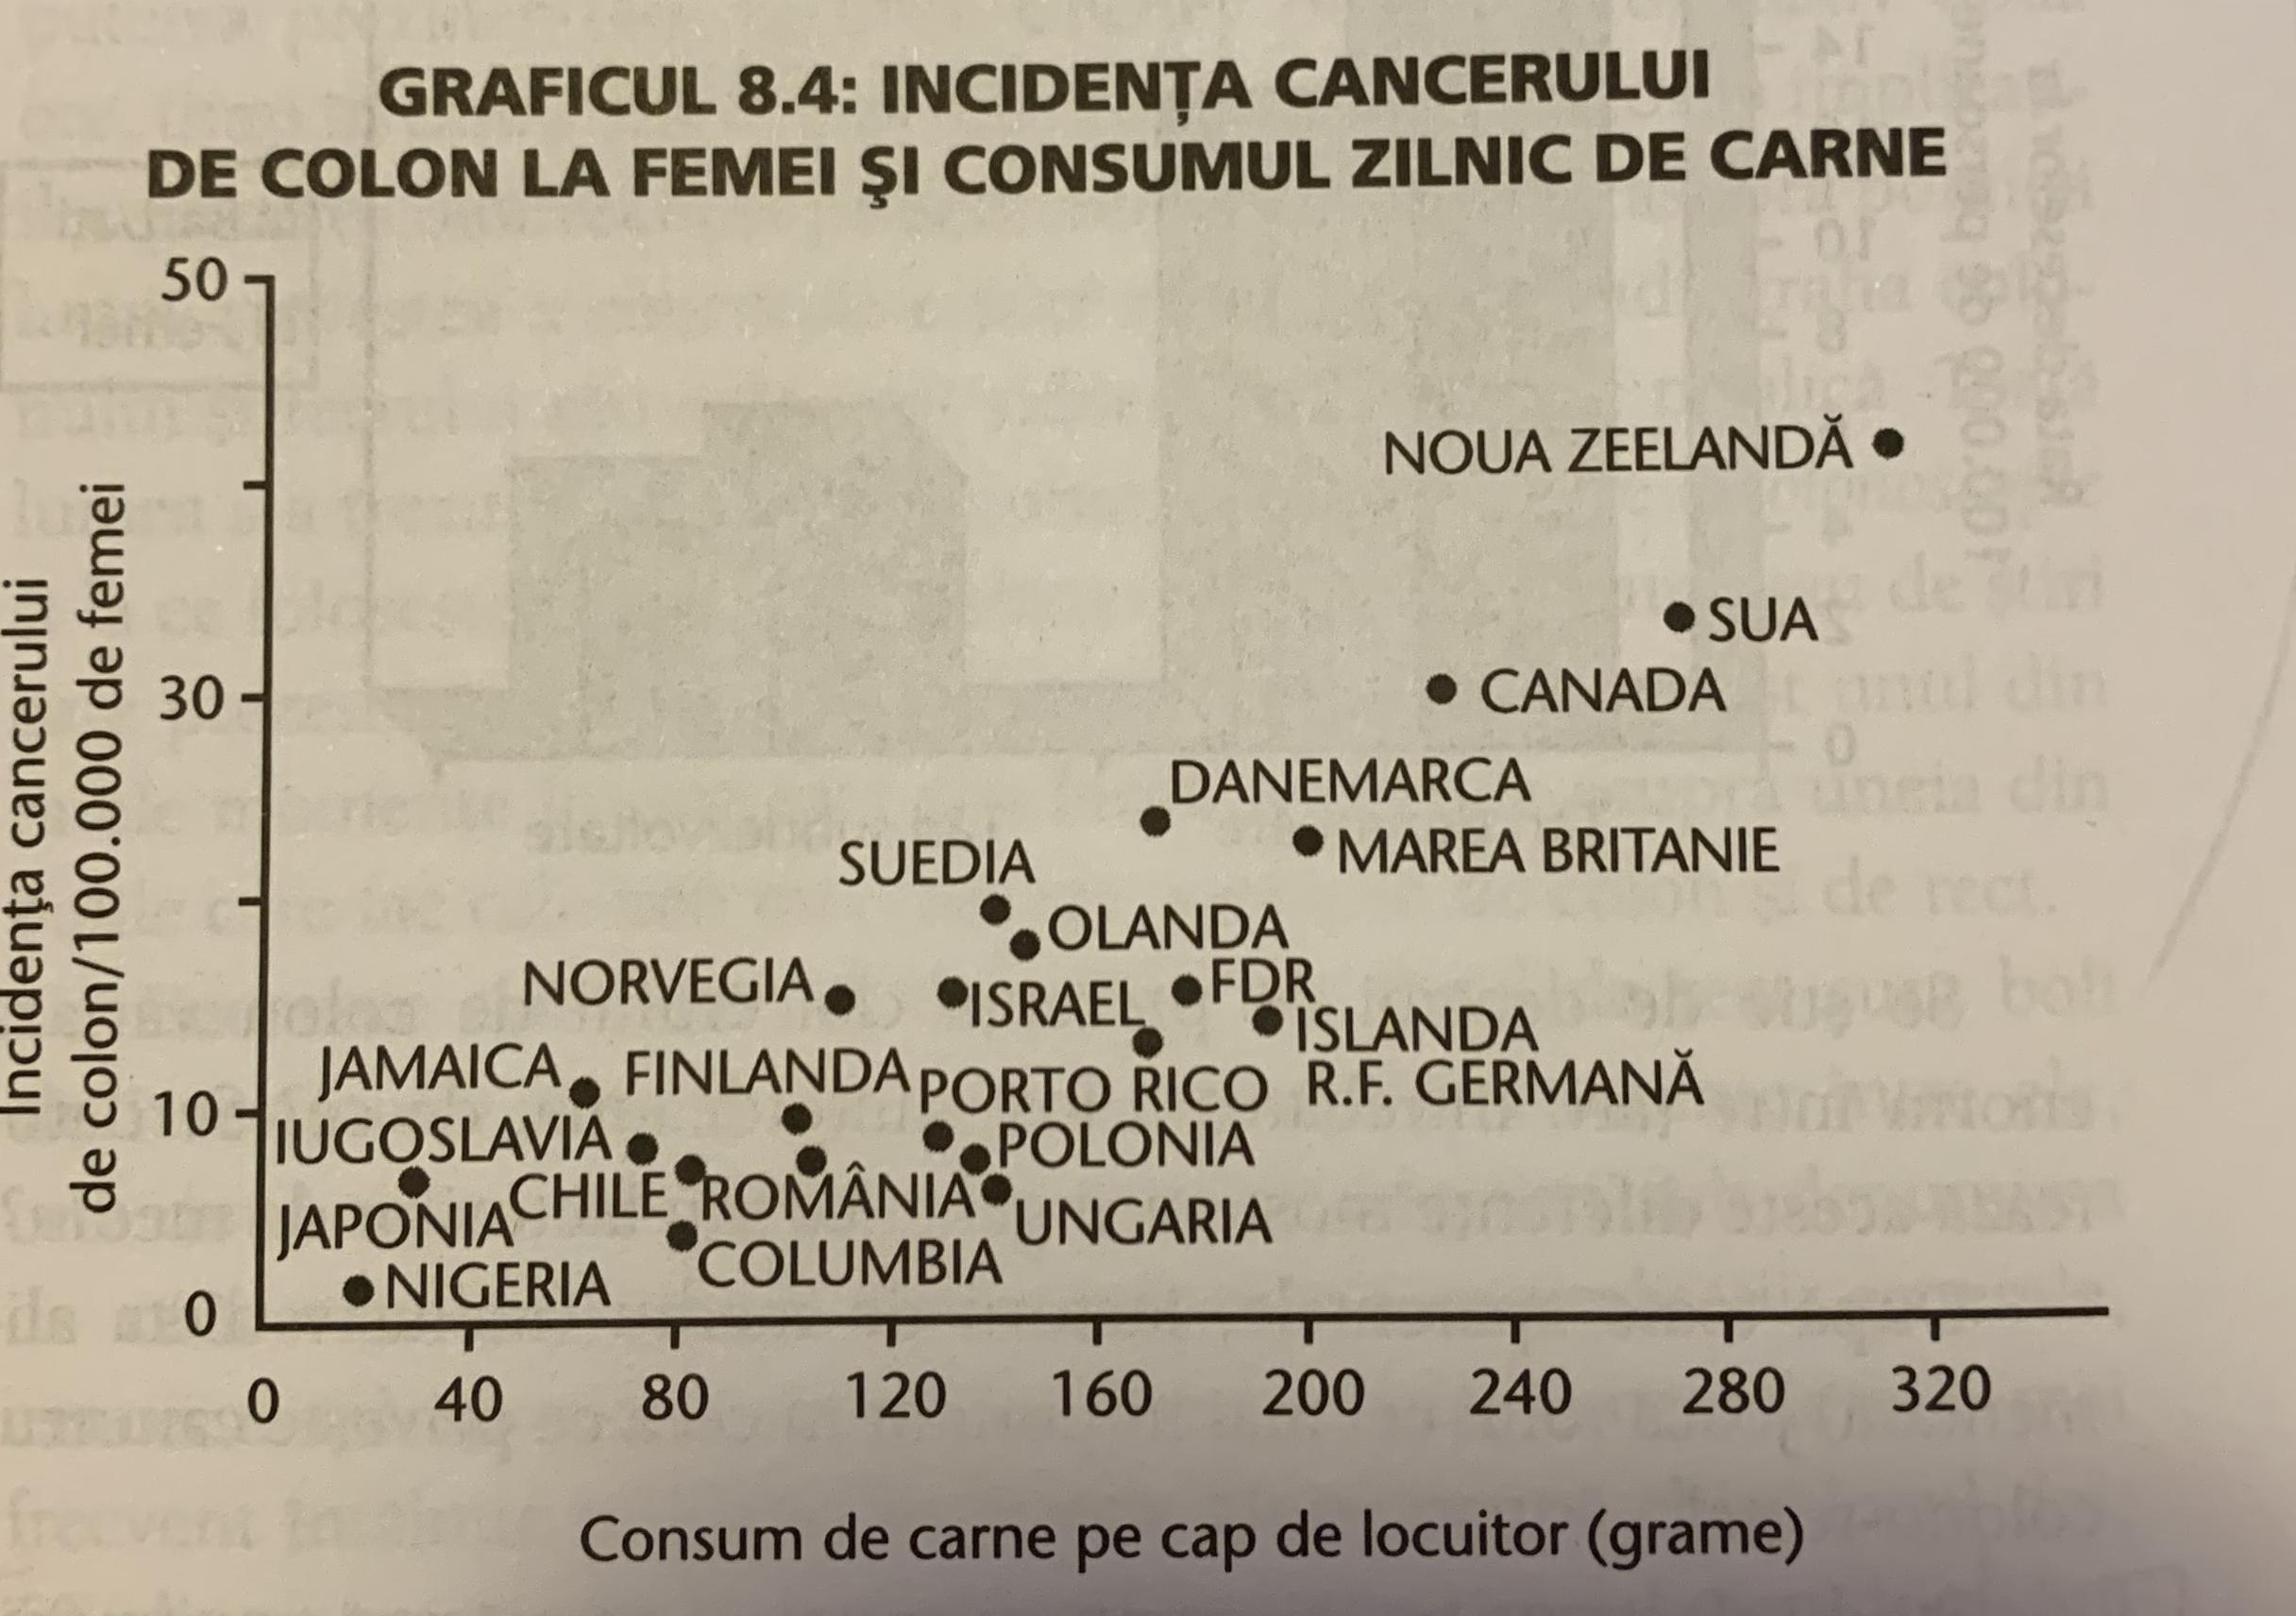 Graficul 8.4 din Studiul China, Dr. T. Colin Campbell